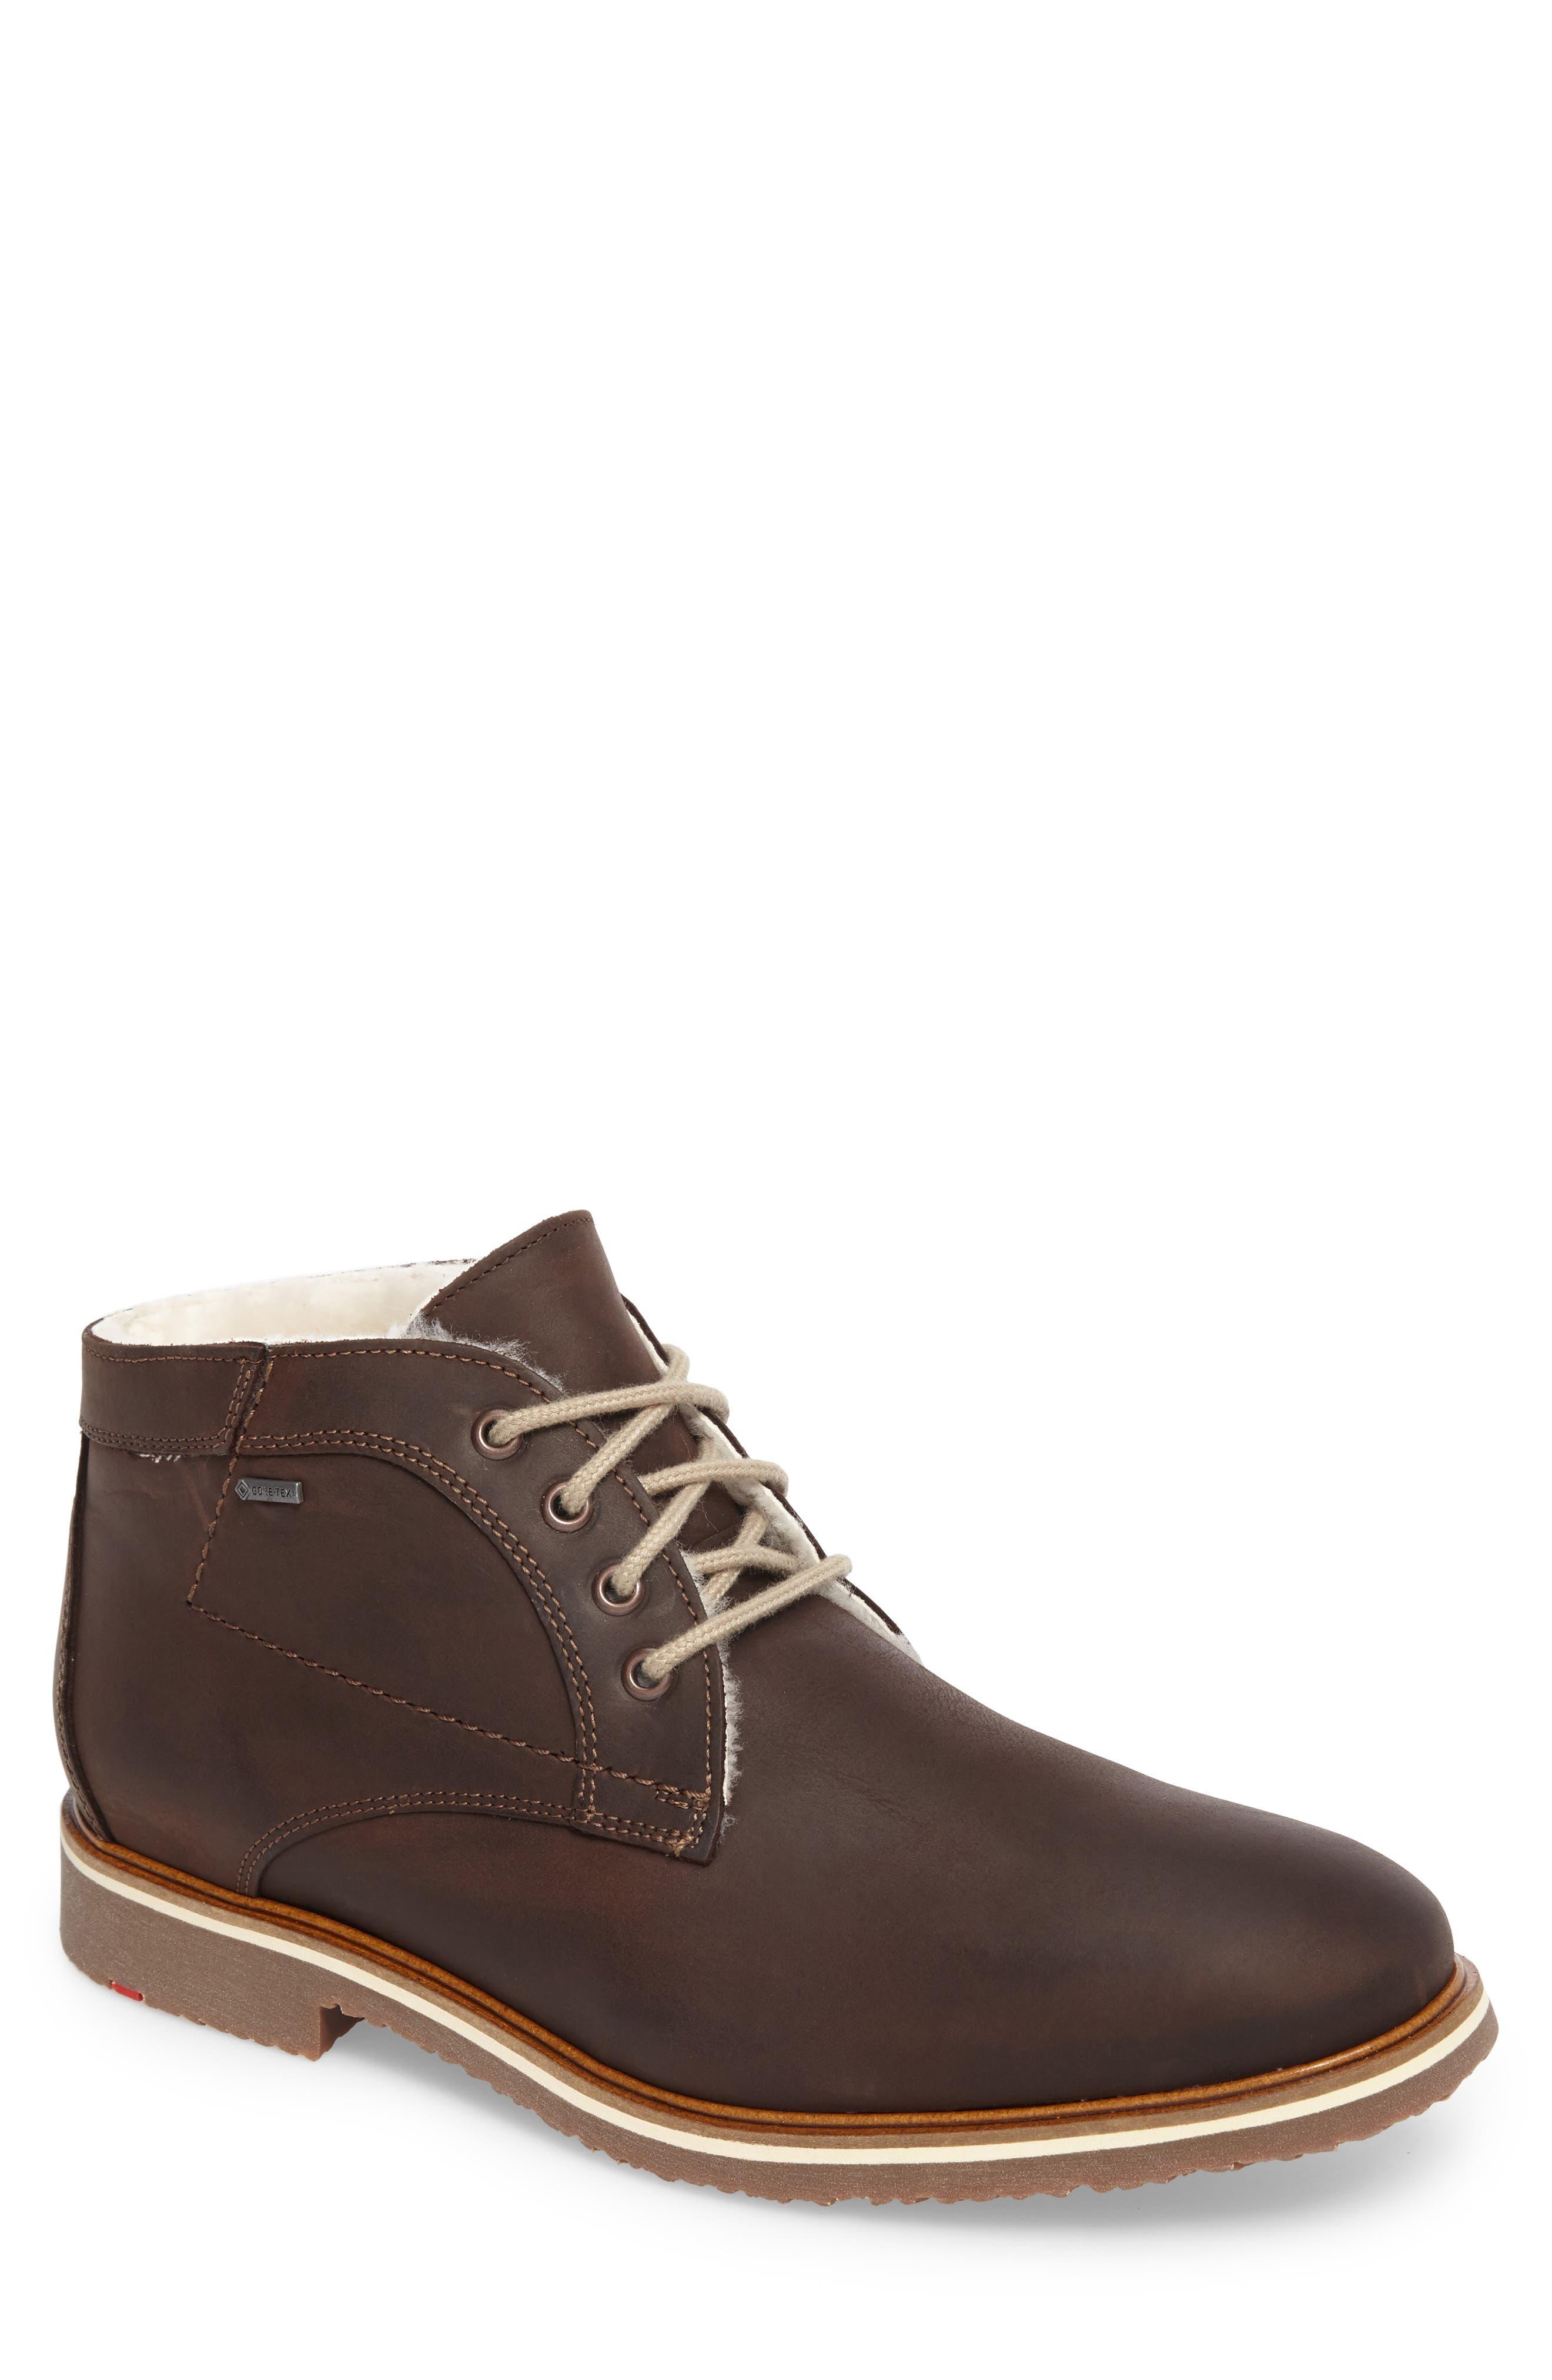 Varus Waterproof Shearlng Lined Chukka Boot,                             Main thumbnail 1, color,                             Ebony Leather